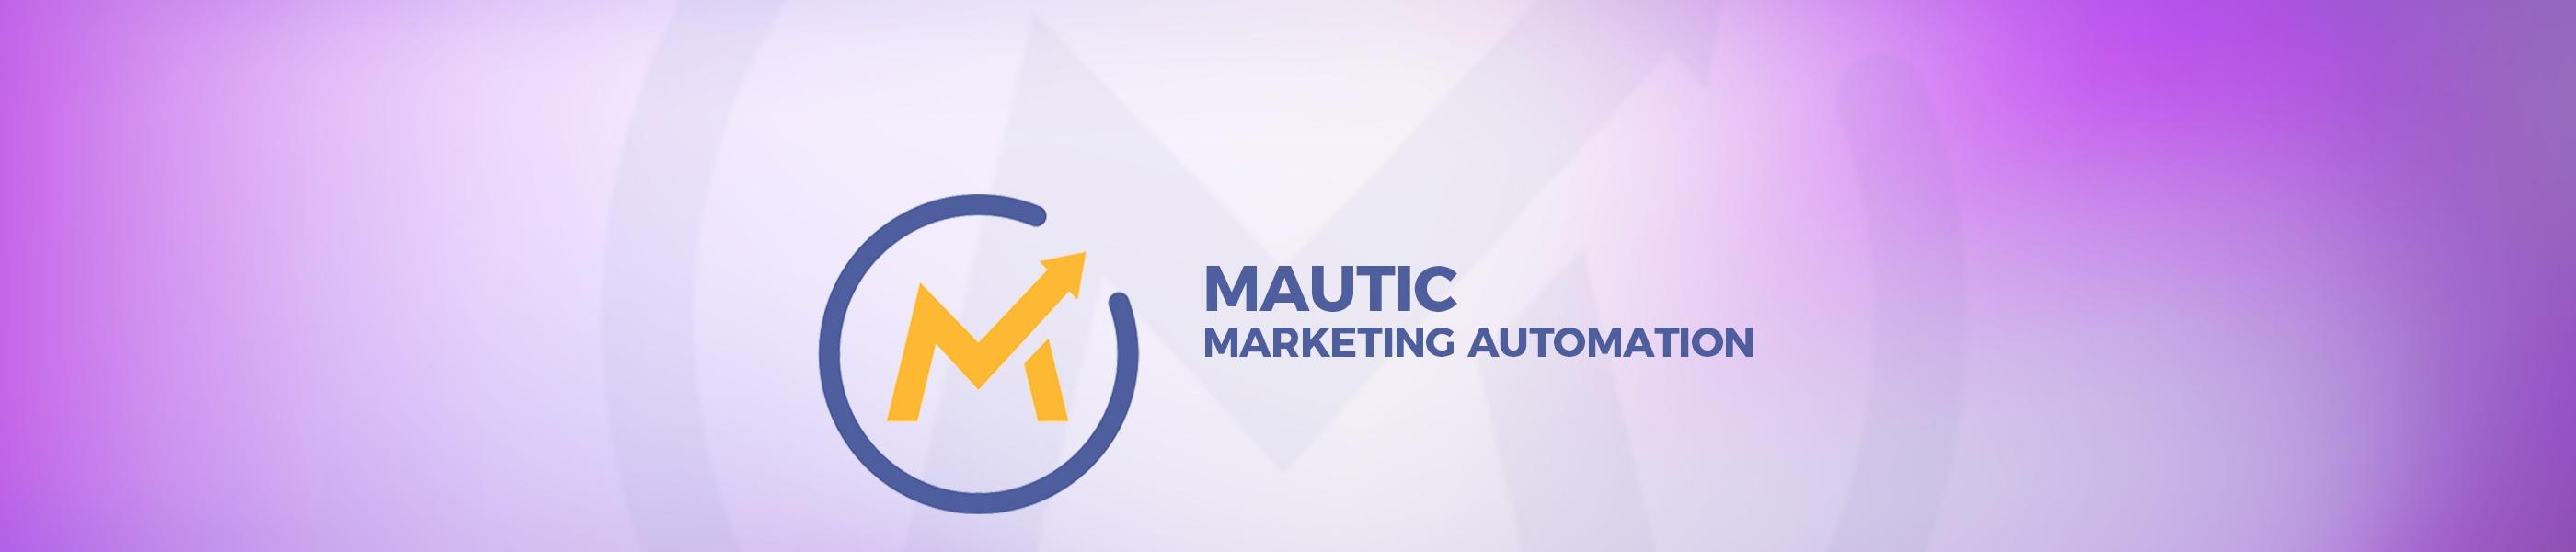 180108_Produkte_Mautic.jpg